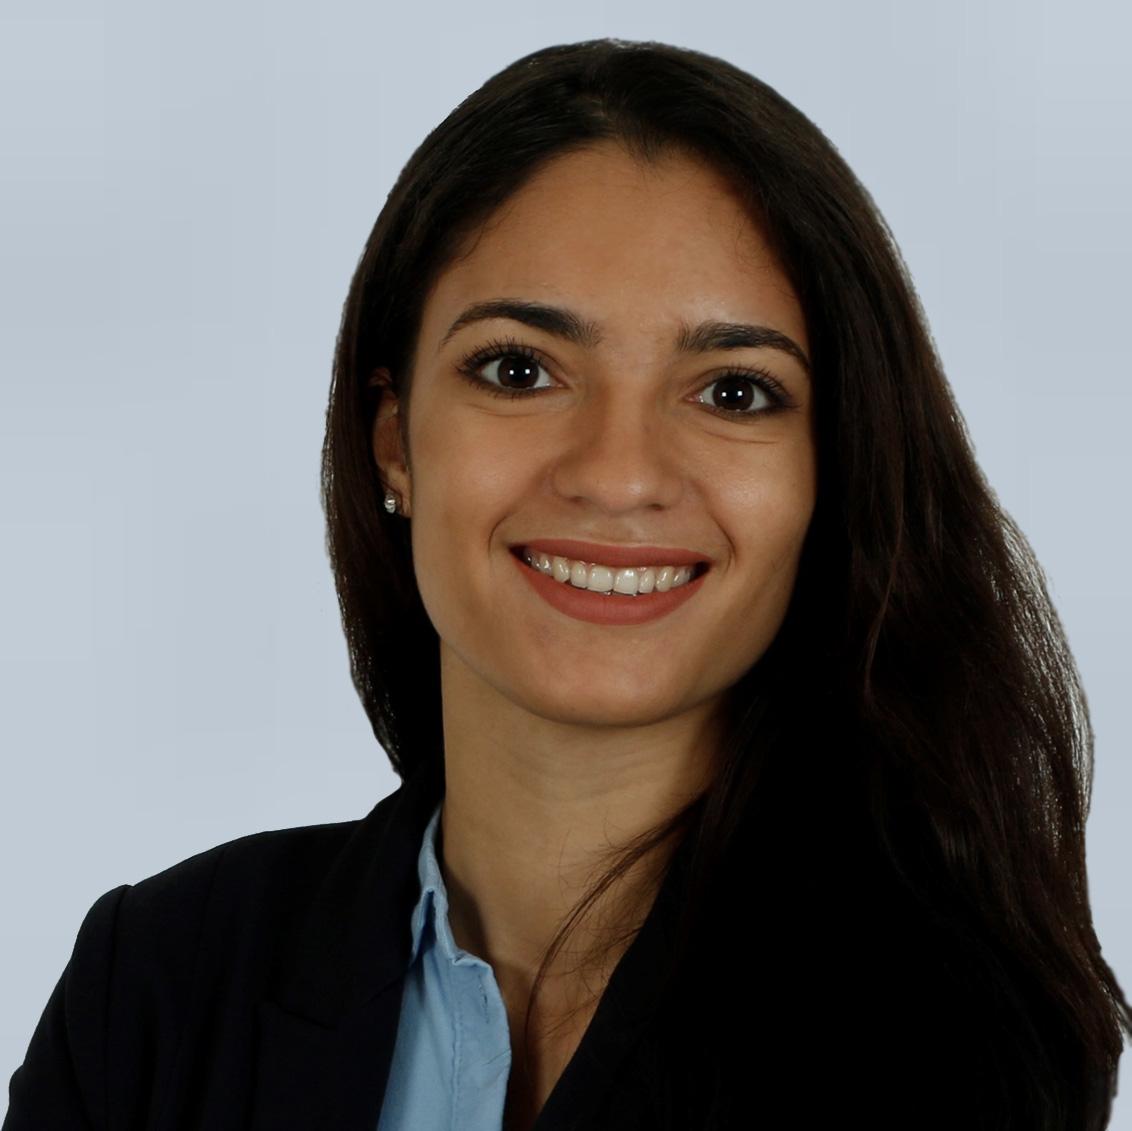 Chiara Leuzinger